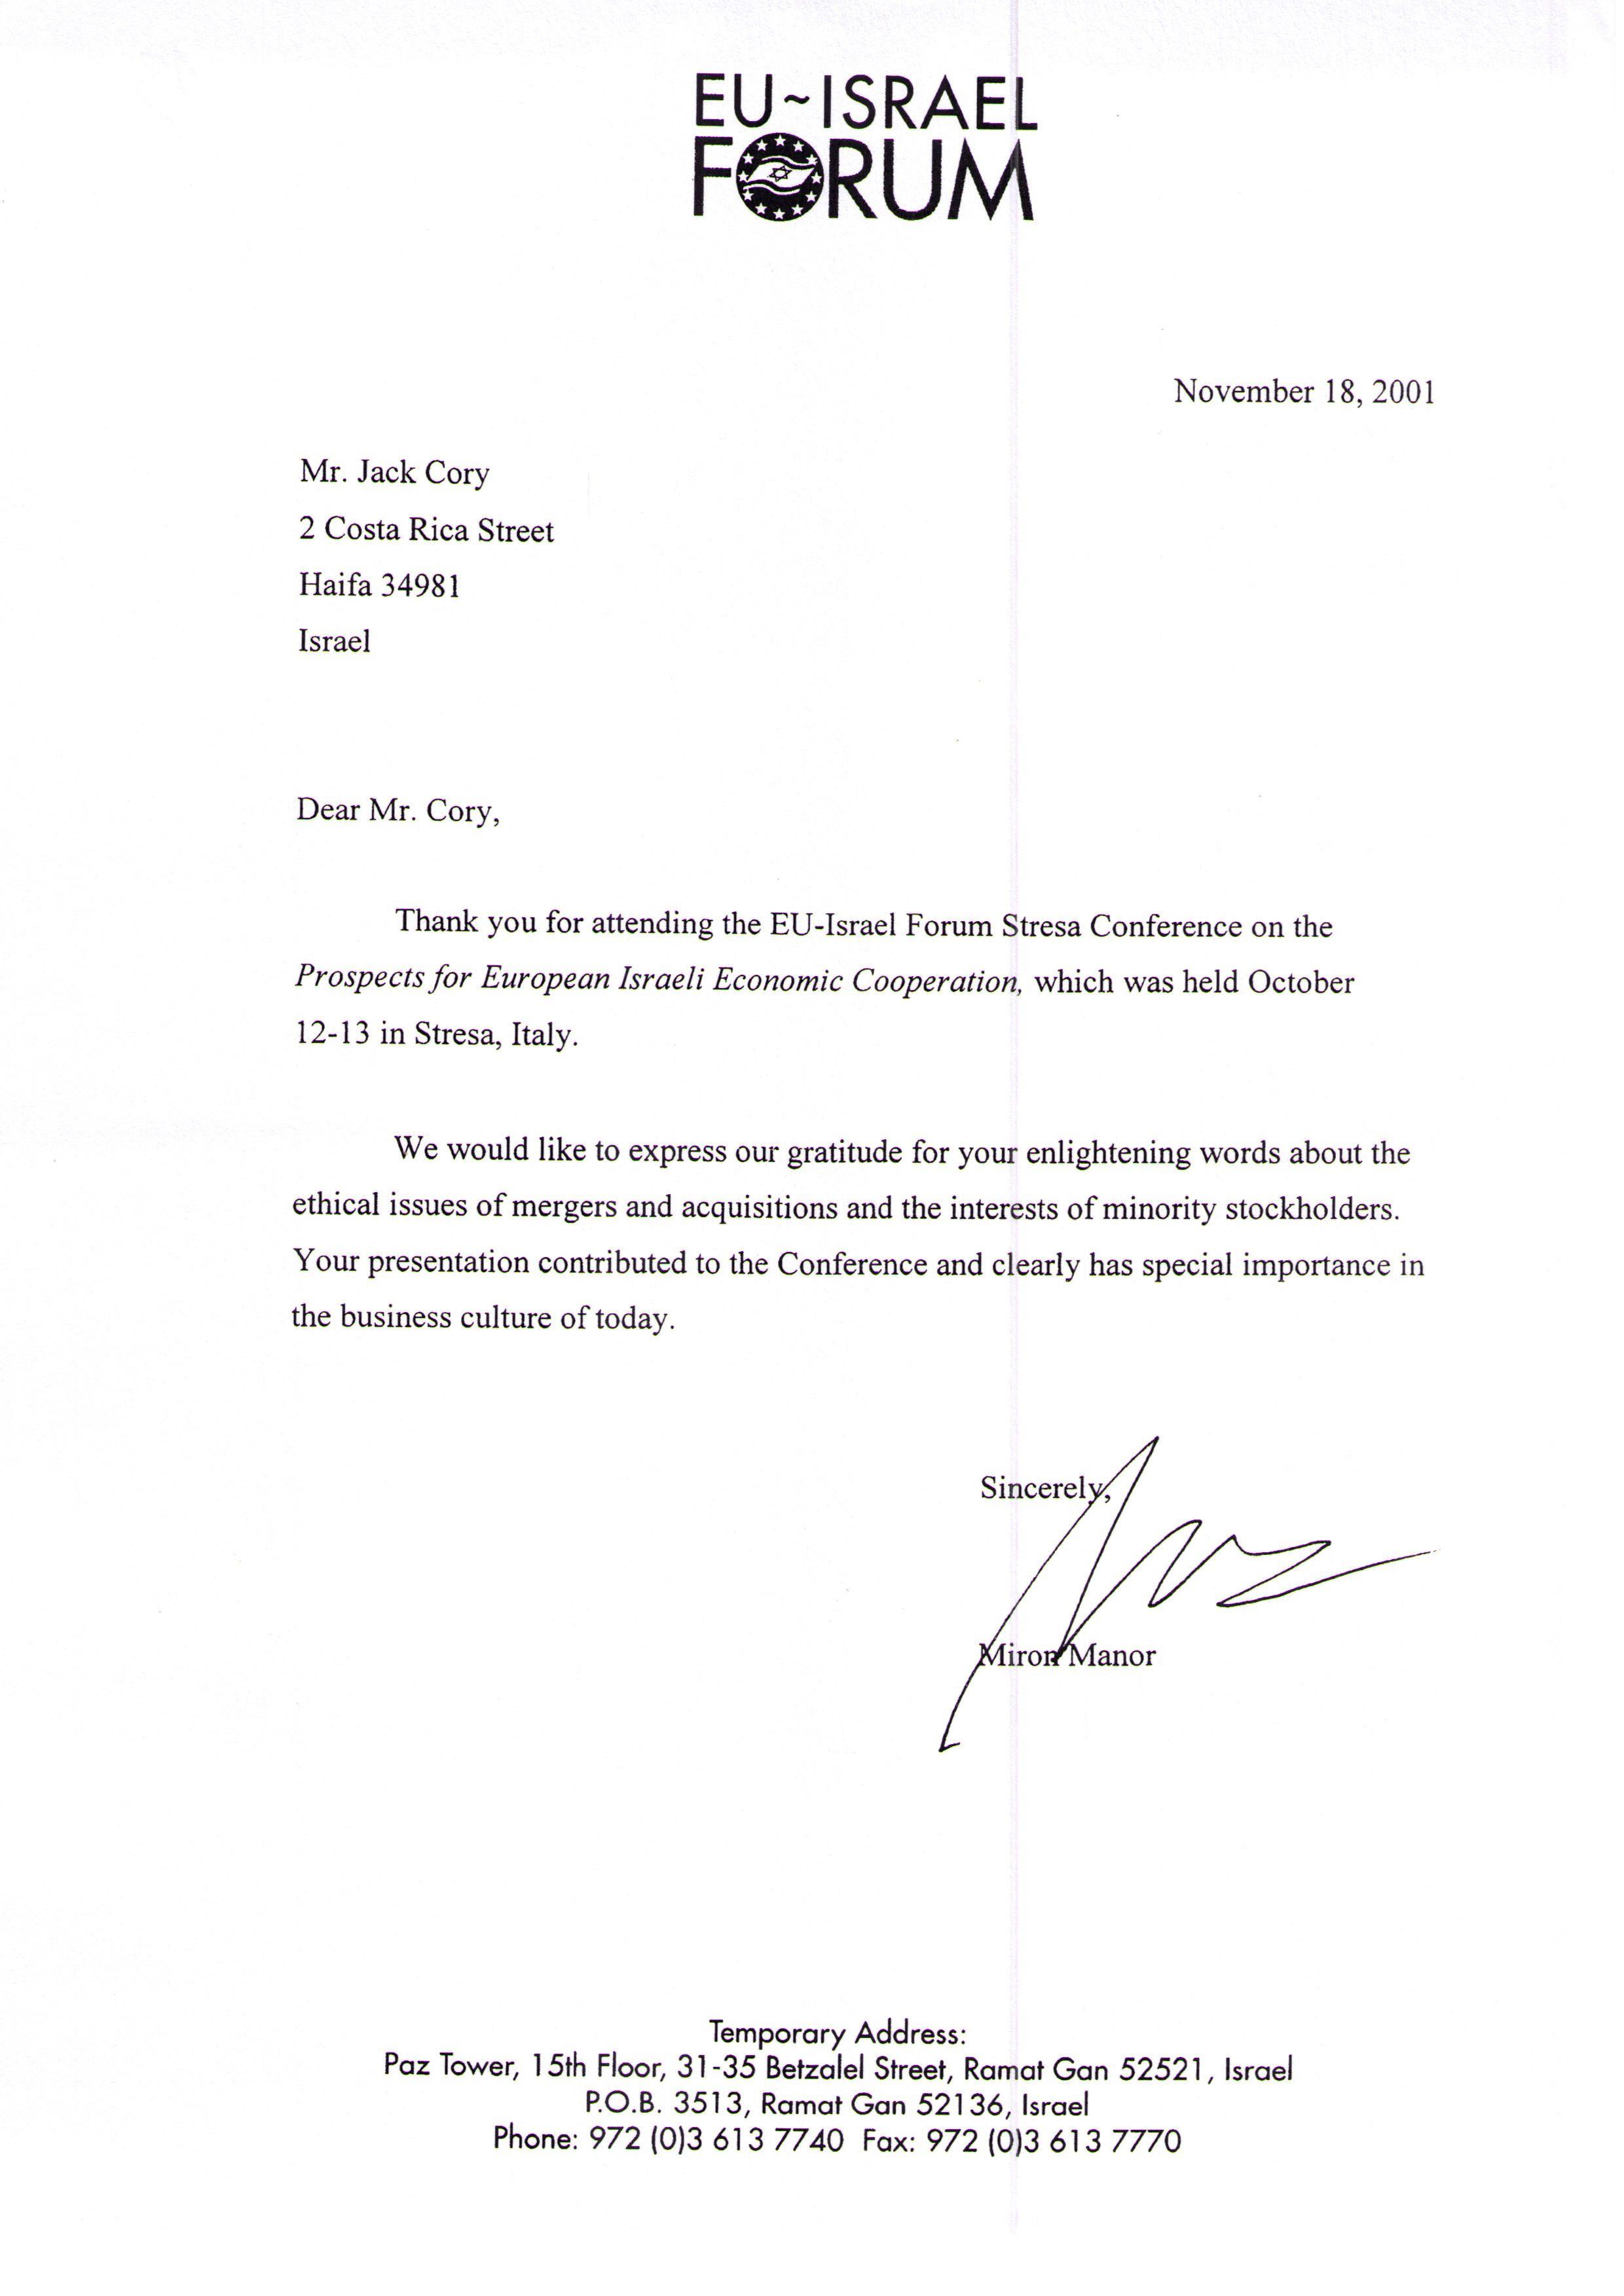 Appreciation Letter  AppreciationLetterByTheEuIsraelForum